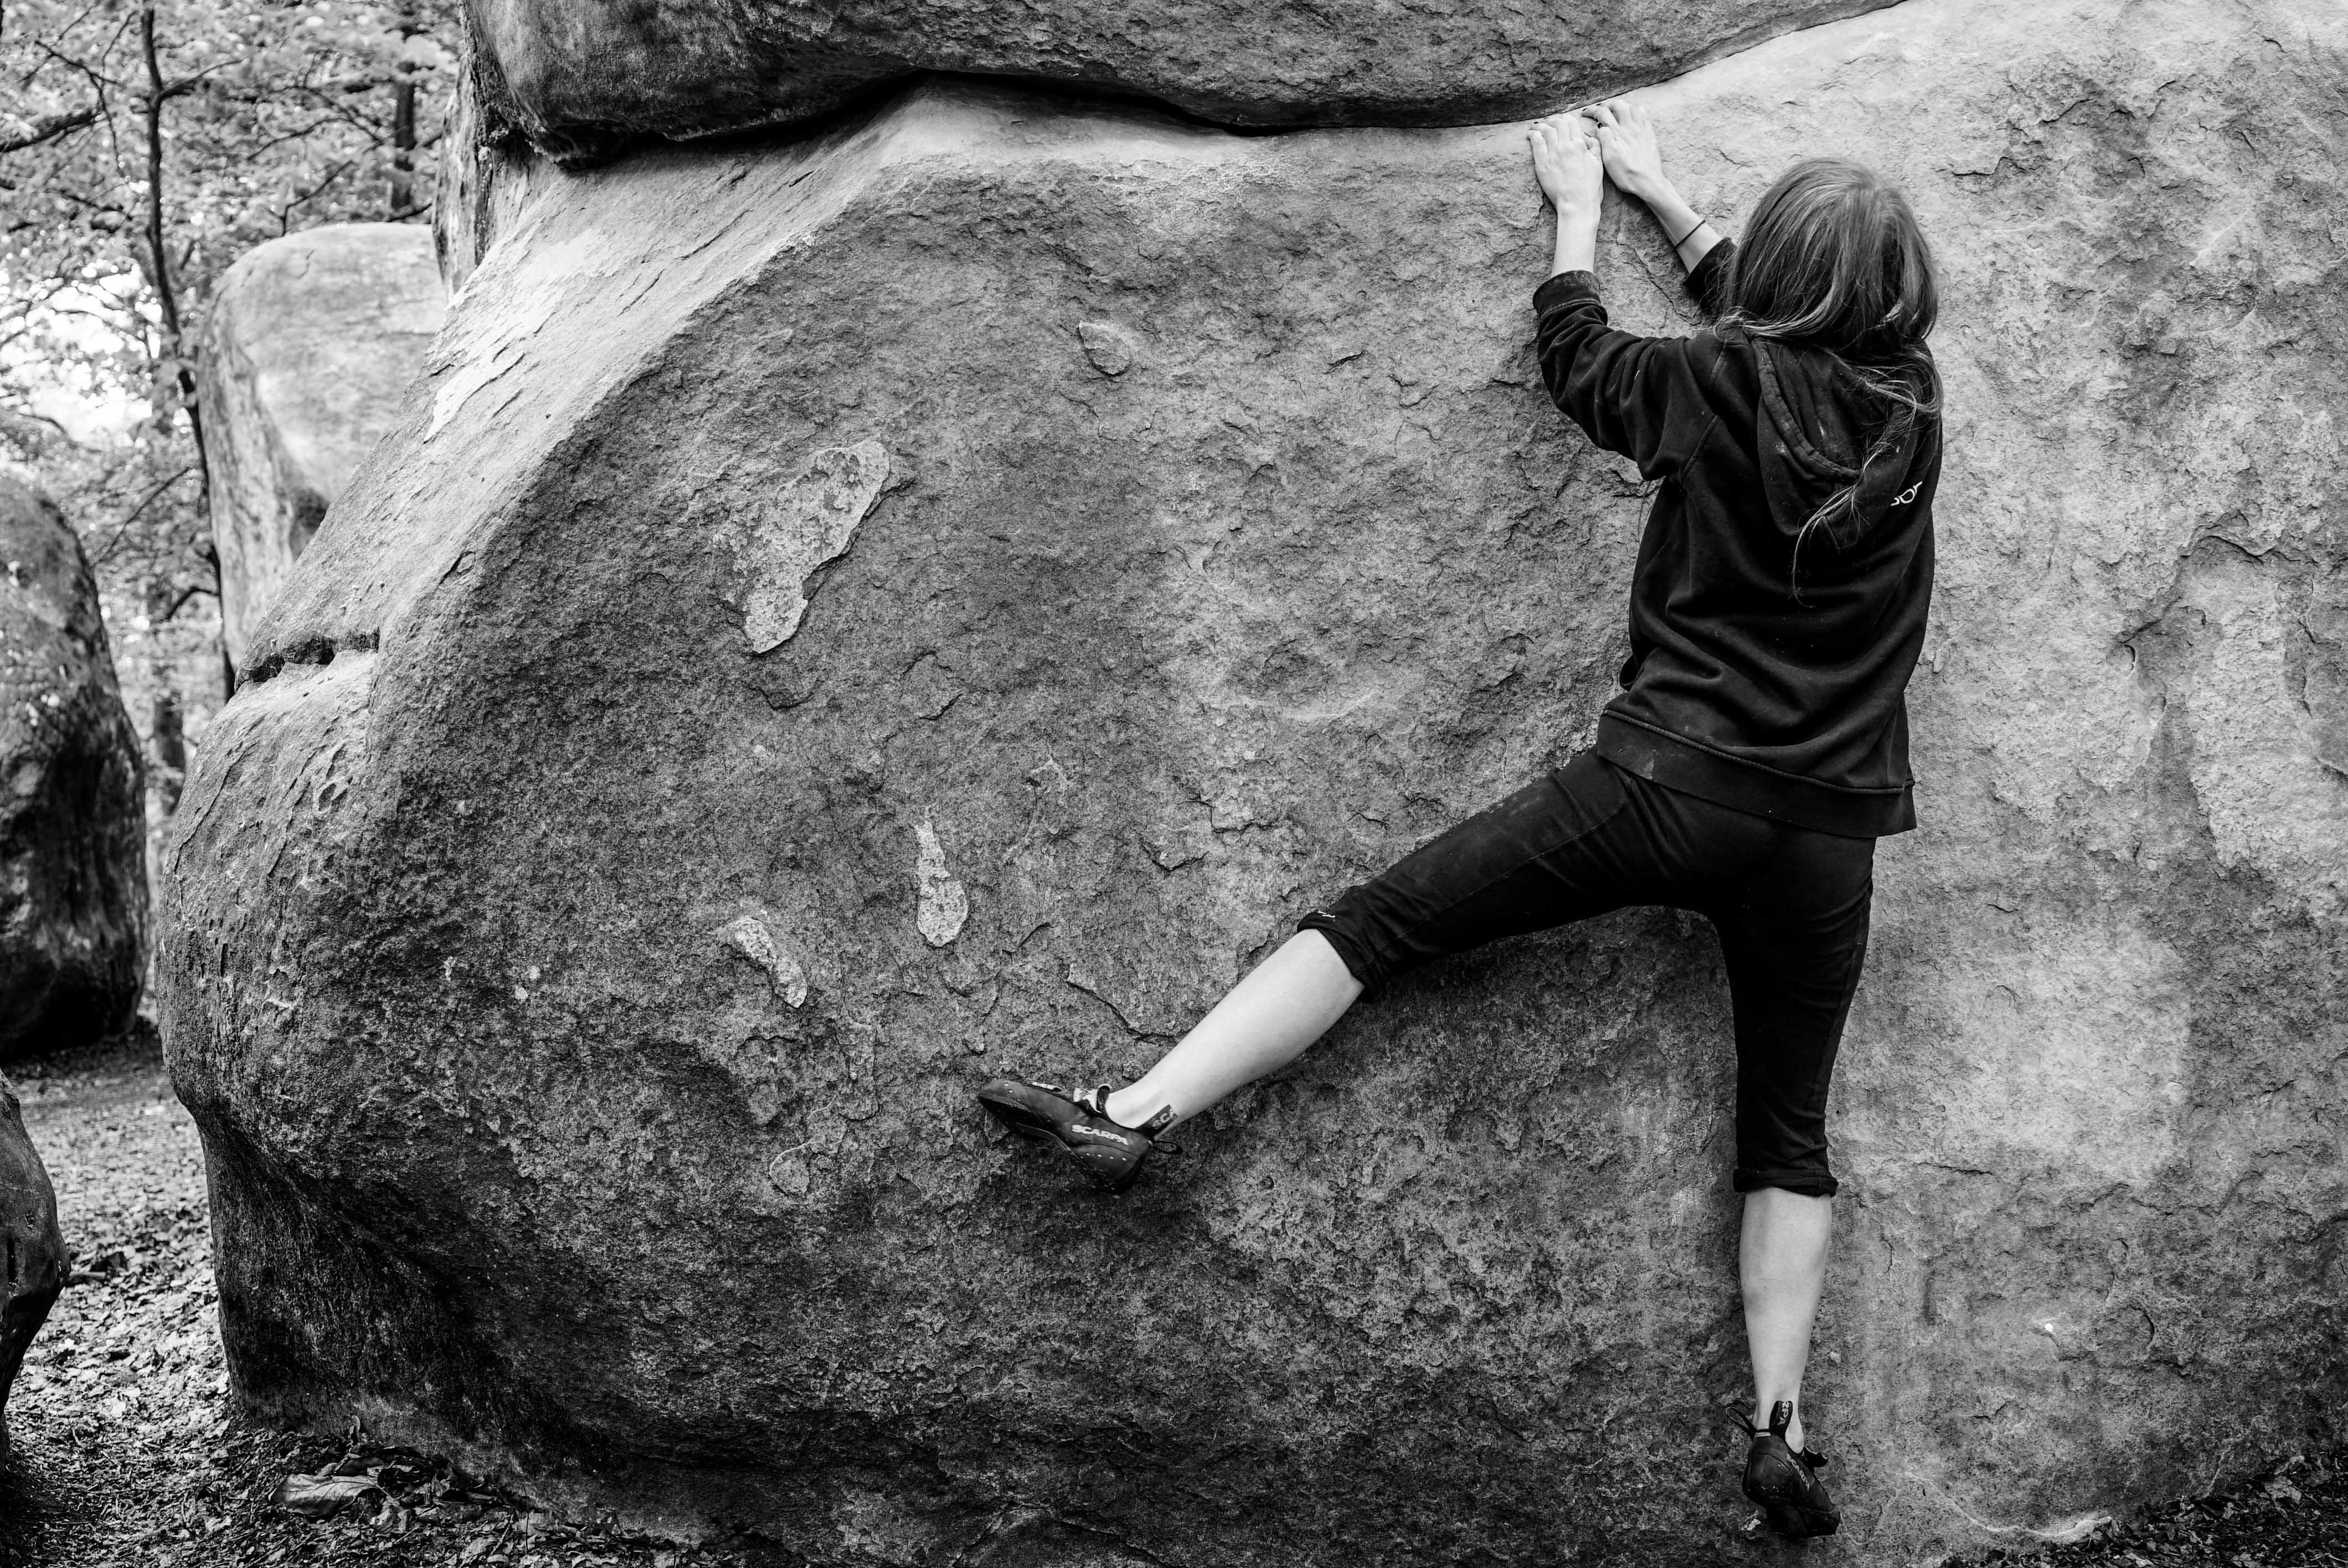 fontainbleau climbing 2016 mike brindley-108